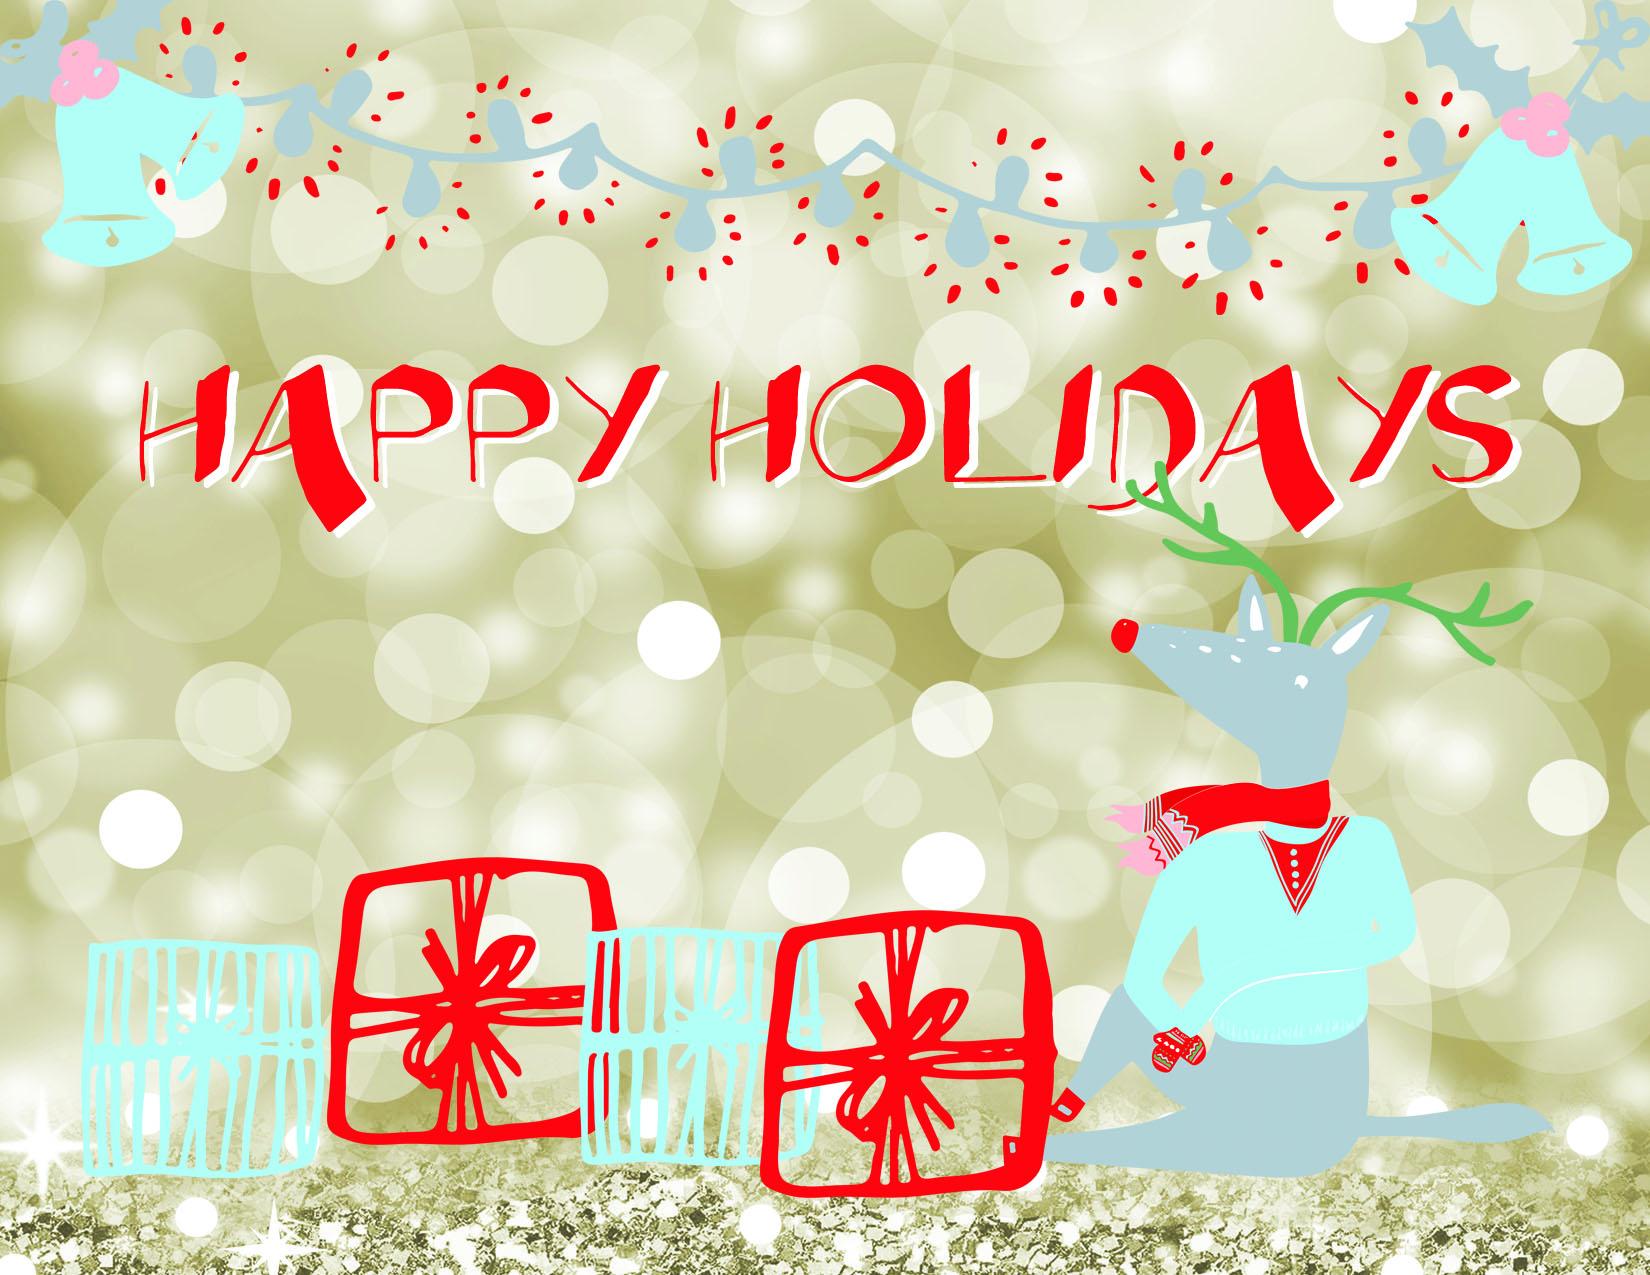 Empowerpreneur Holiday Greeting Cards